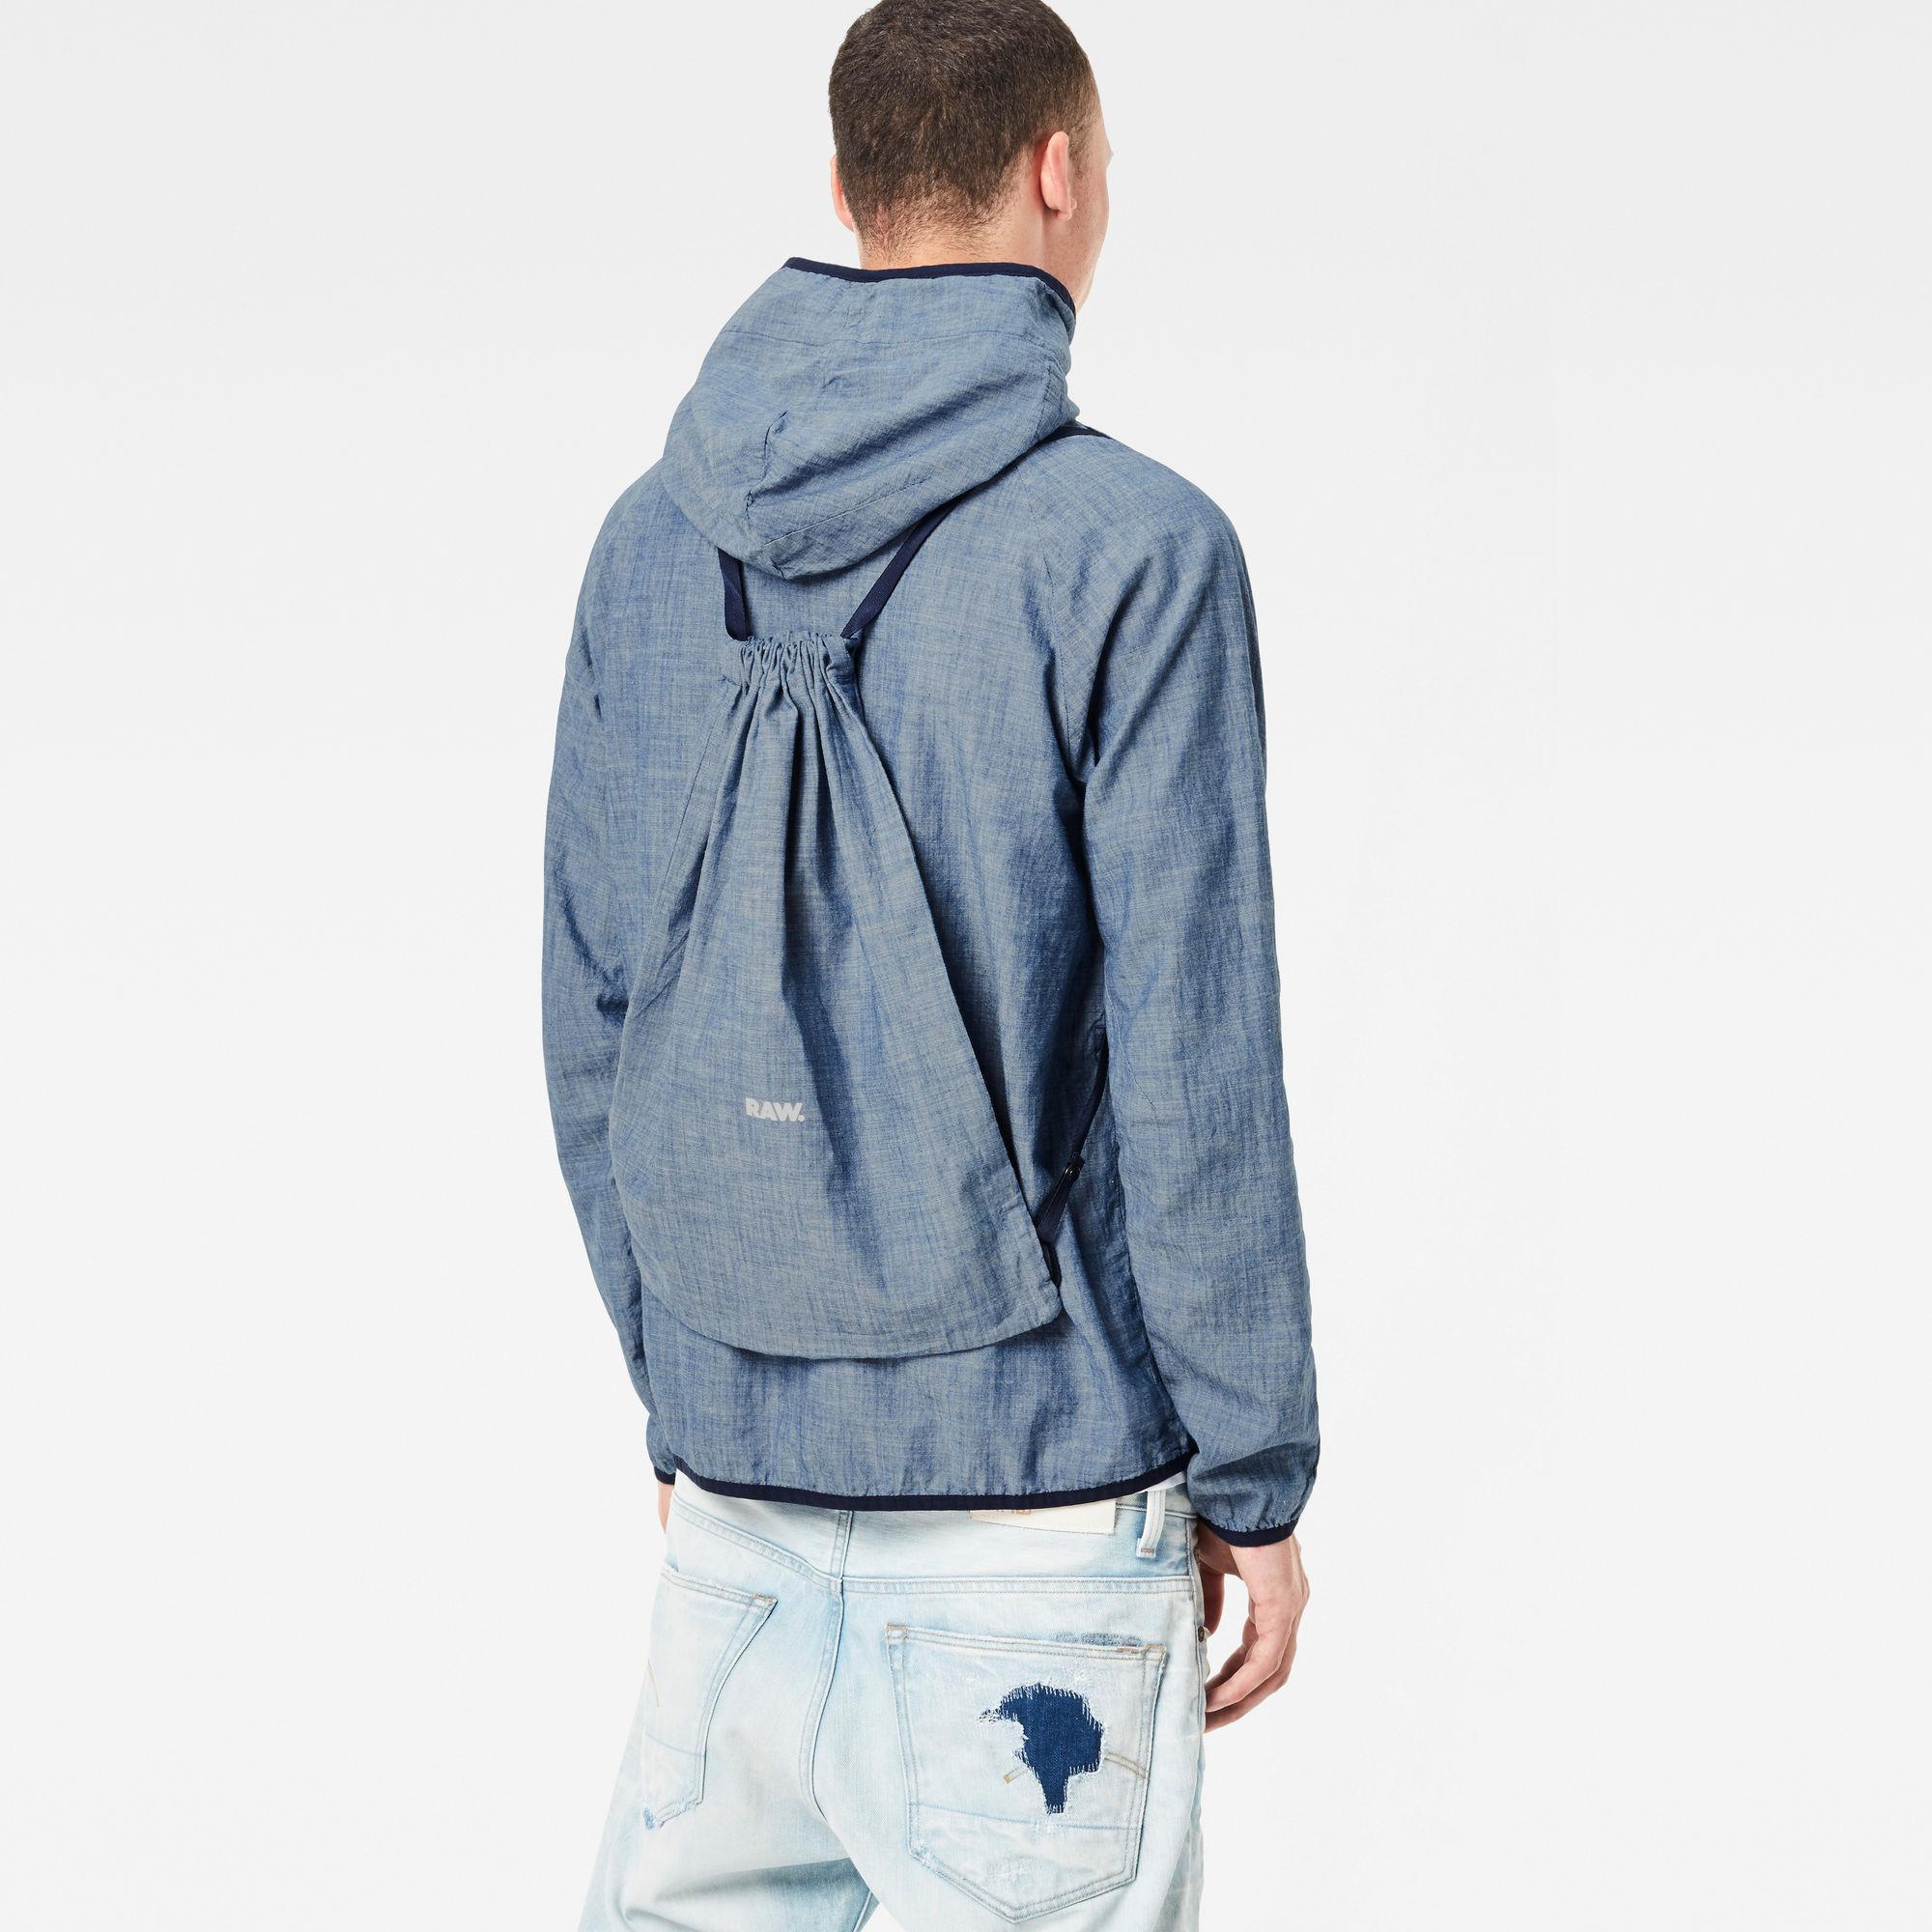 Strett Hooded Gym-Bag Jacket